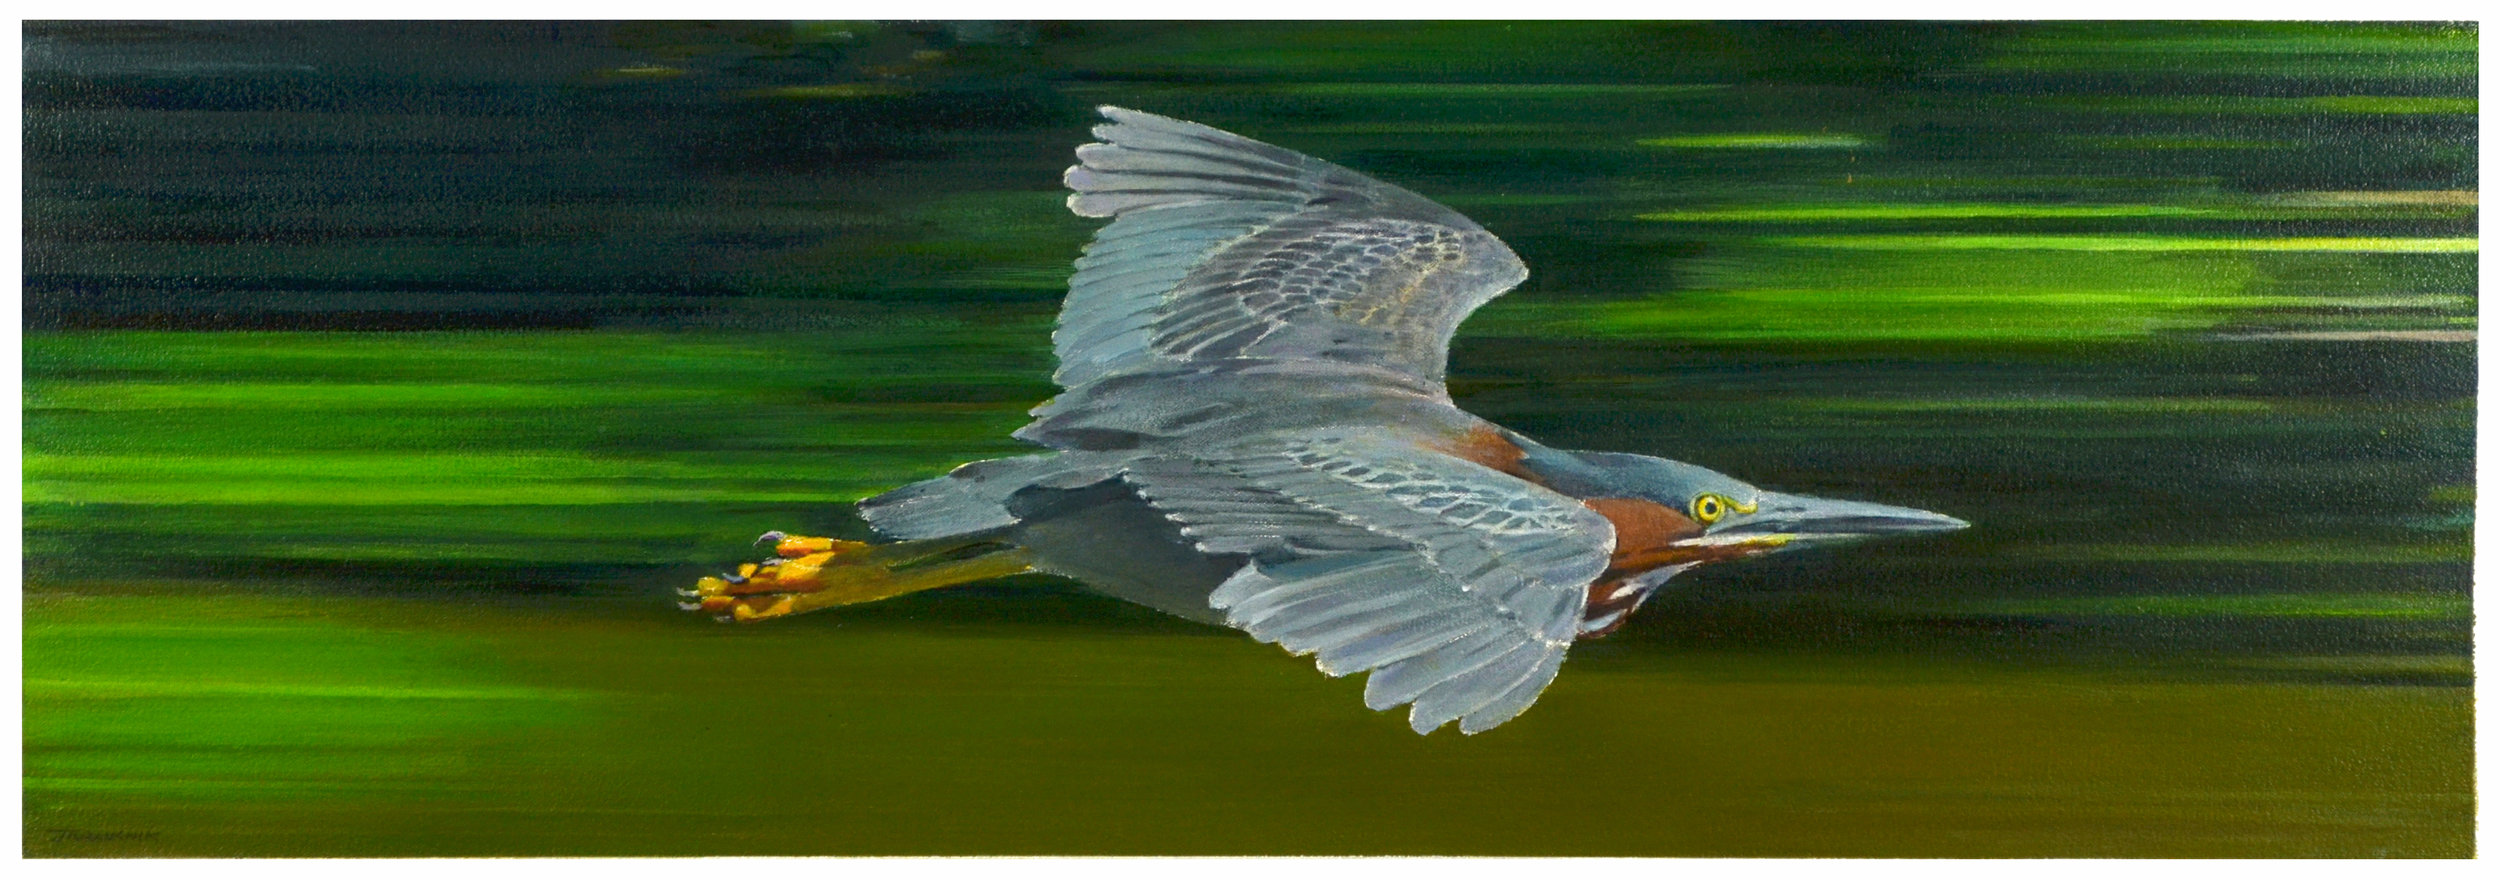 Bird in Flight - Green Heron